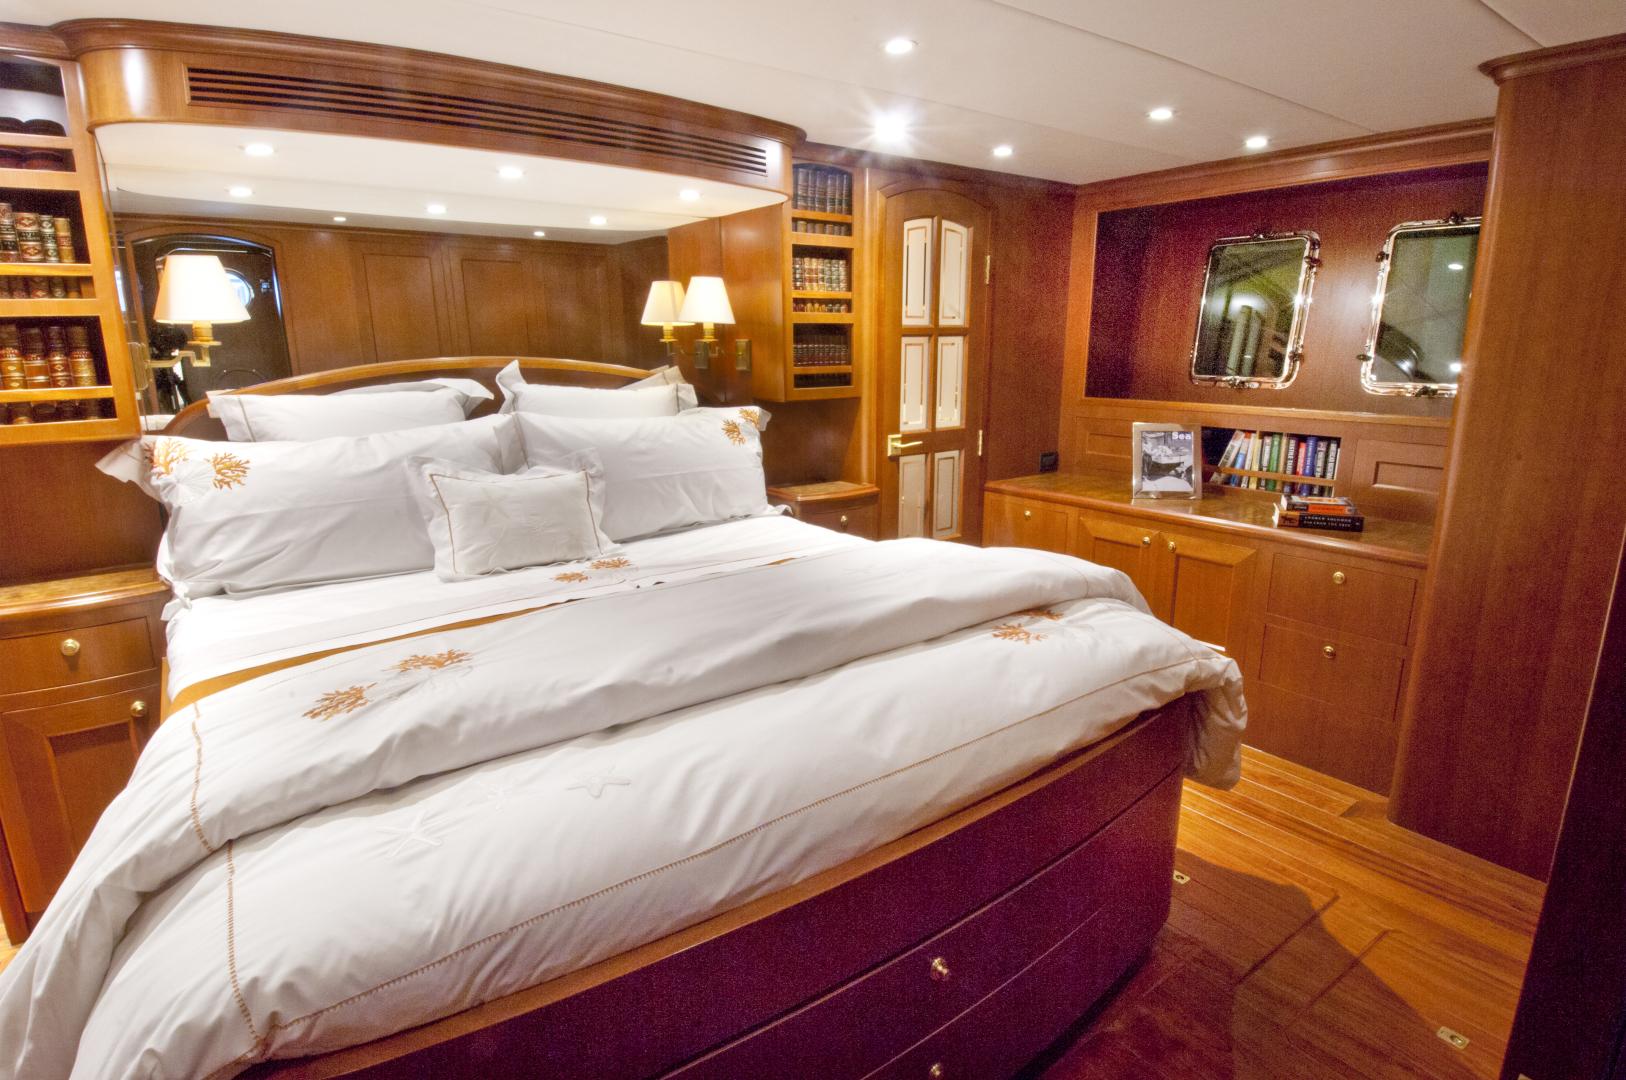 Offshore Yachts-Motoryacht 2020 -United States-1117785   Thumbnail